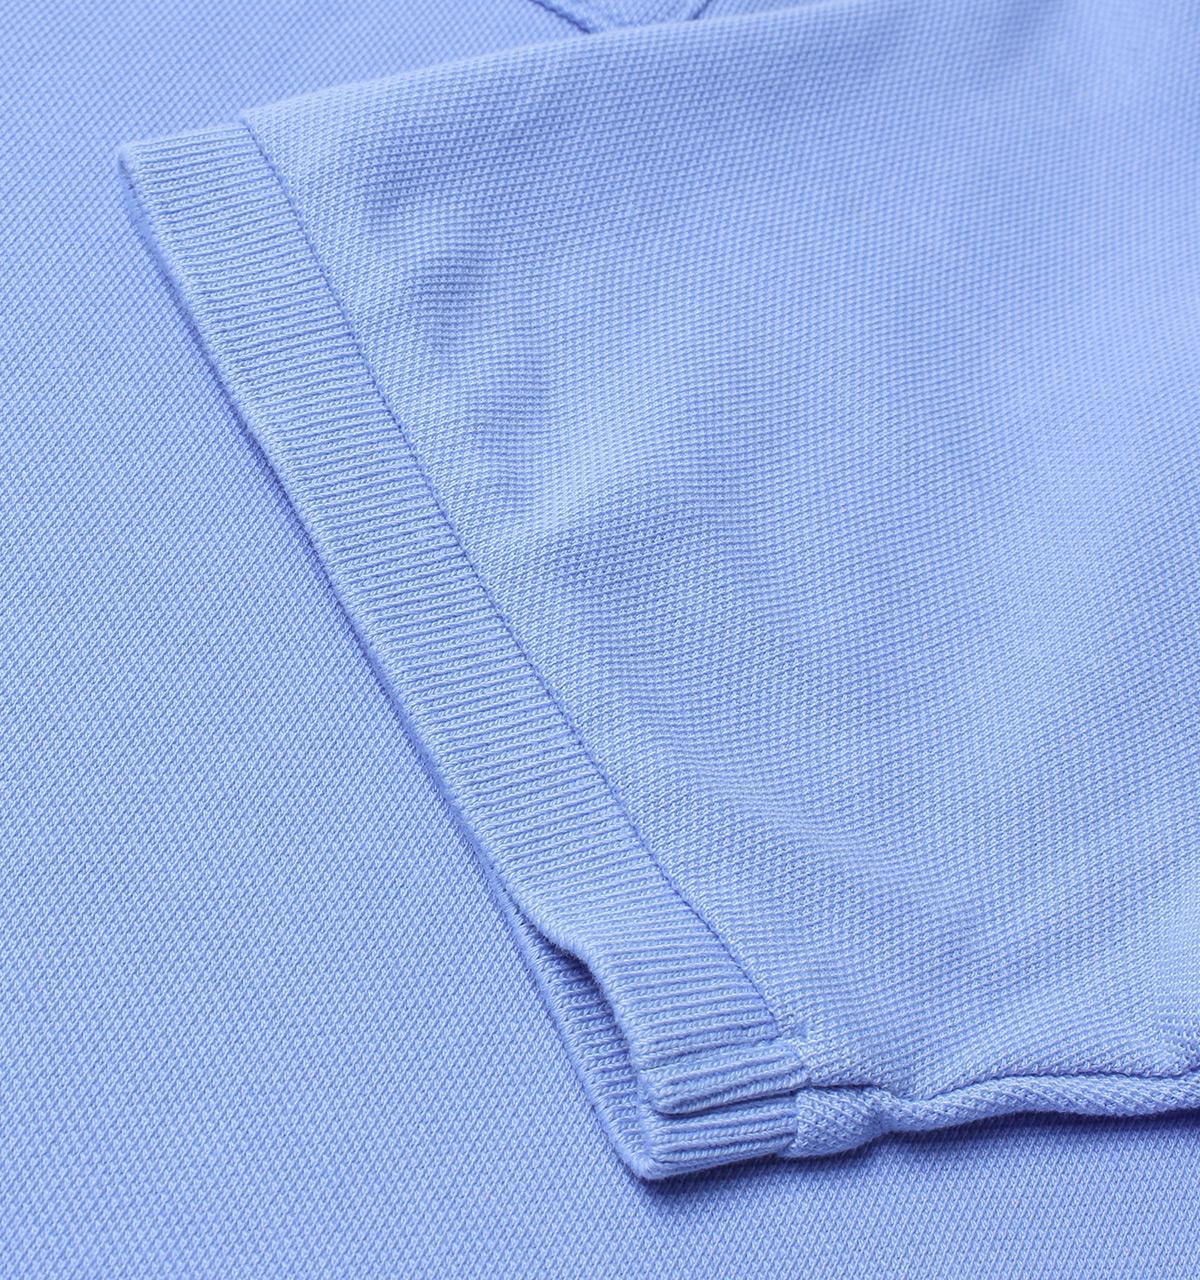 Blue Ralph For Men New Fit Shirt Harbour Pique Polo Lauren Slim kiwTXZuOP